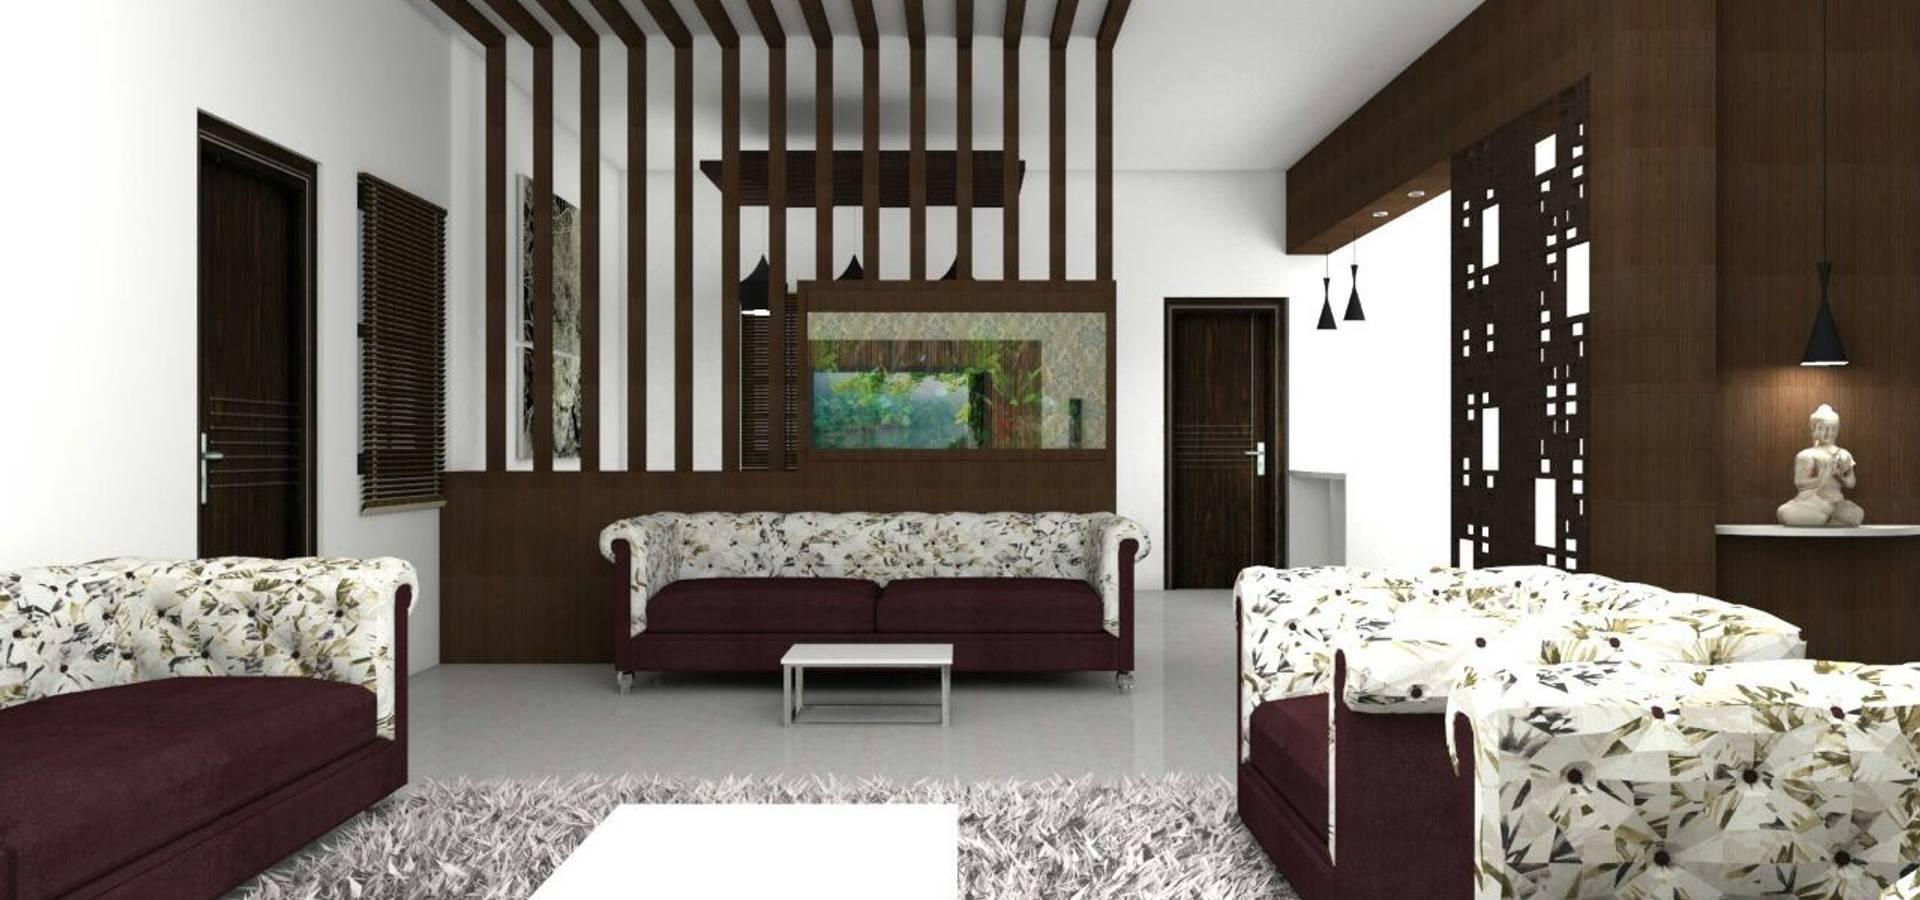 Kruthi Interiors